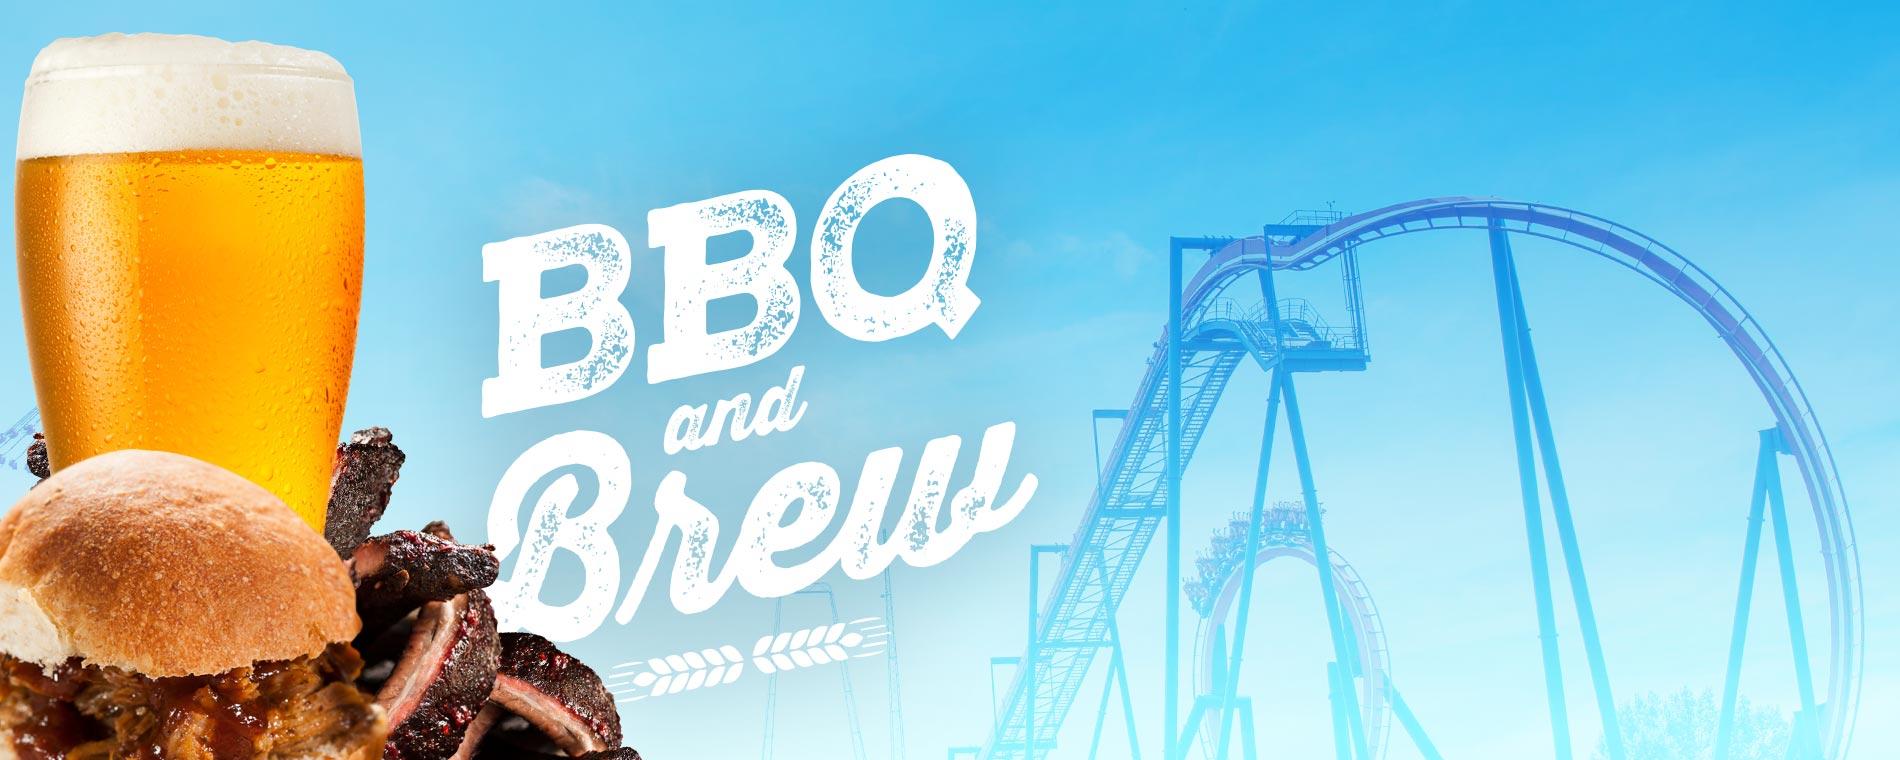 2017 Worlds of Fun Brew BBQ